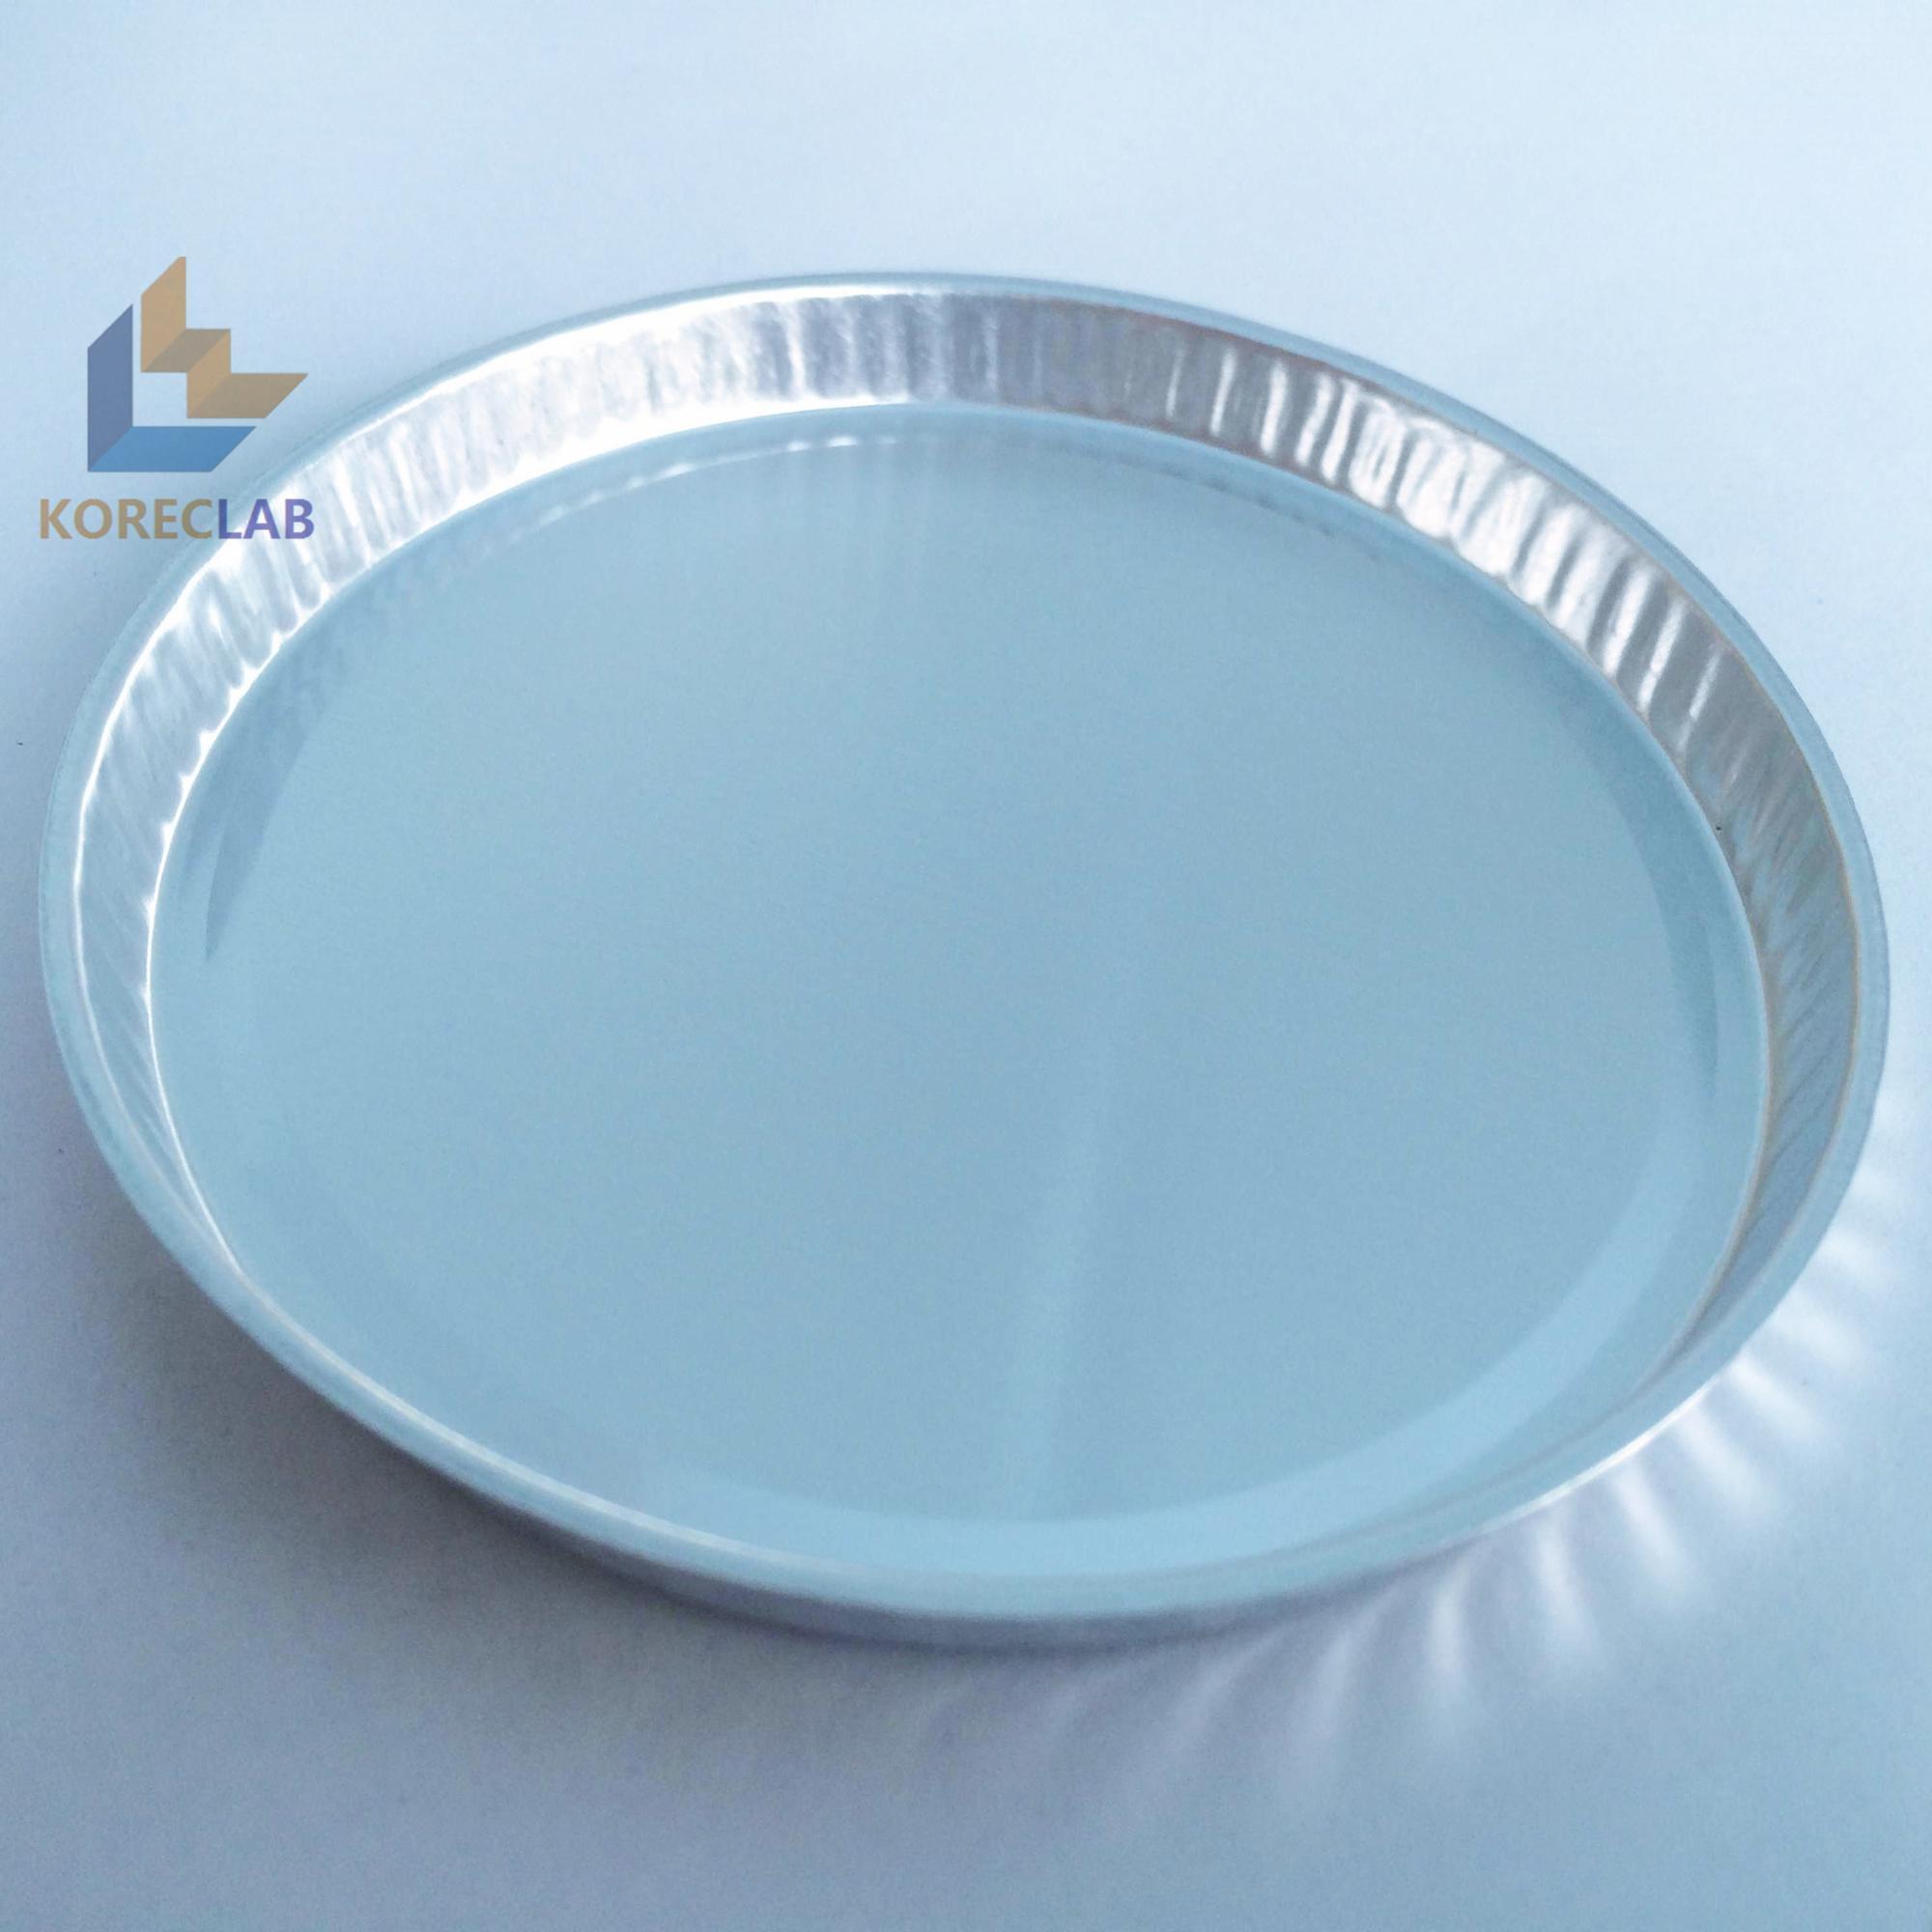 OD 102mm Aluminum Round Weighing Pan/Dish 6